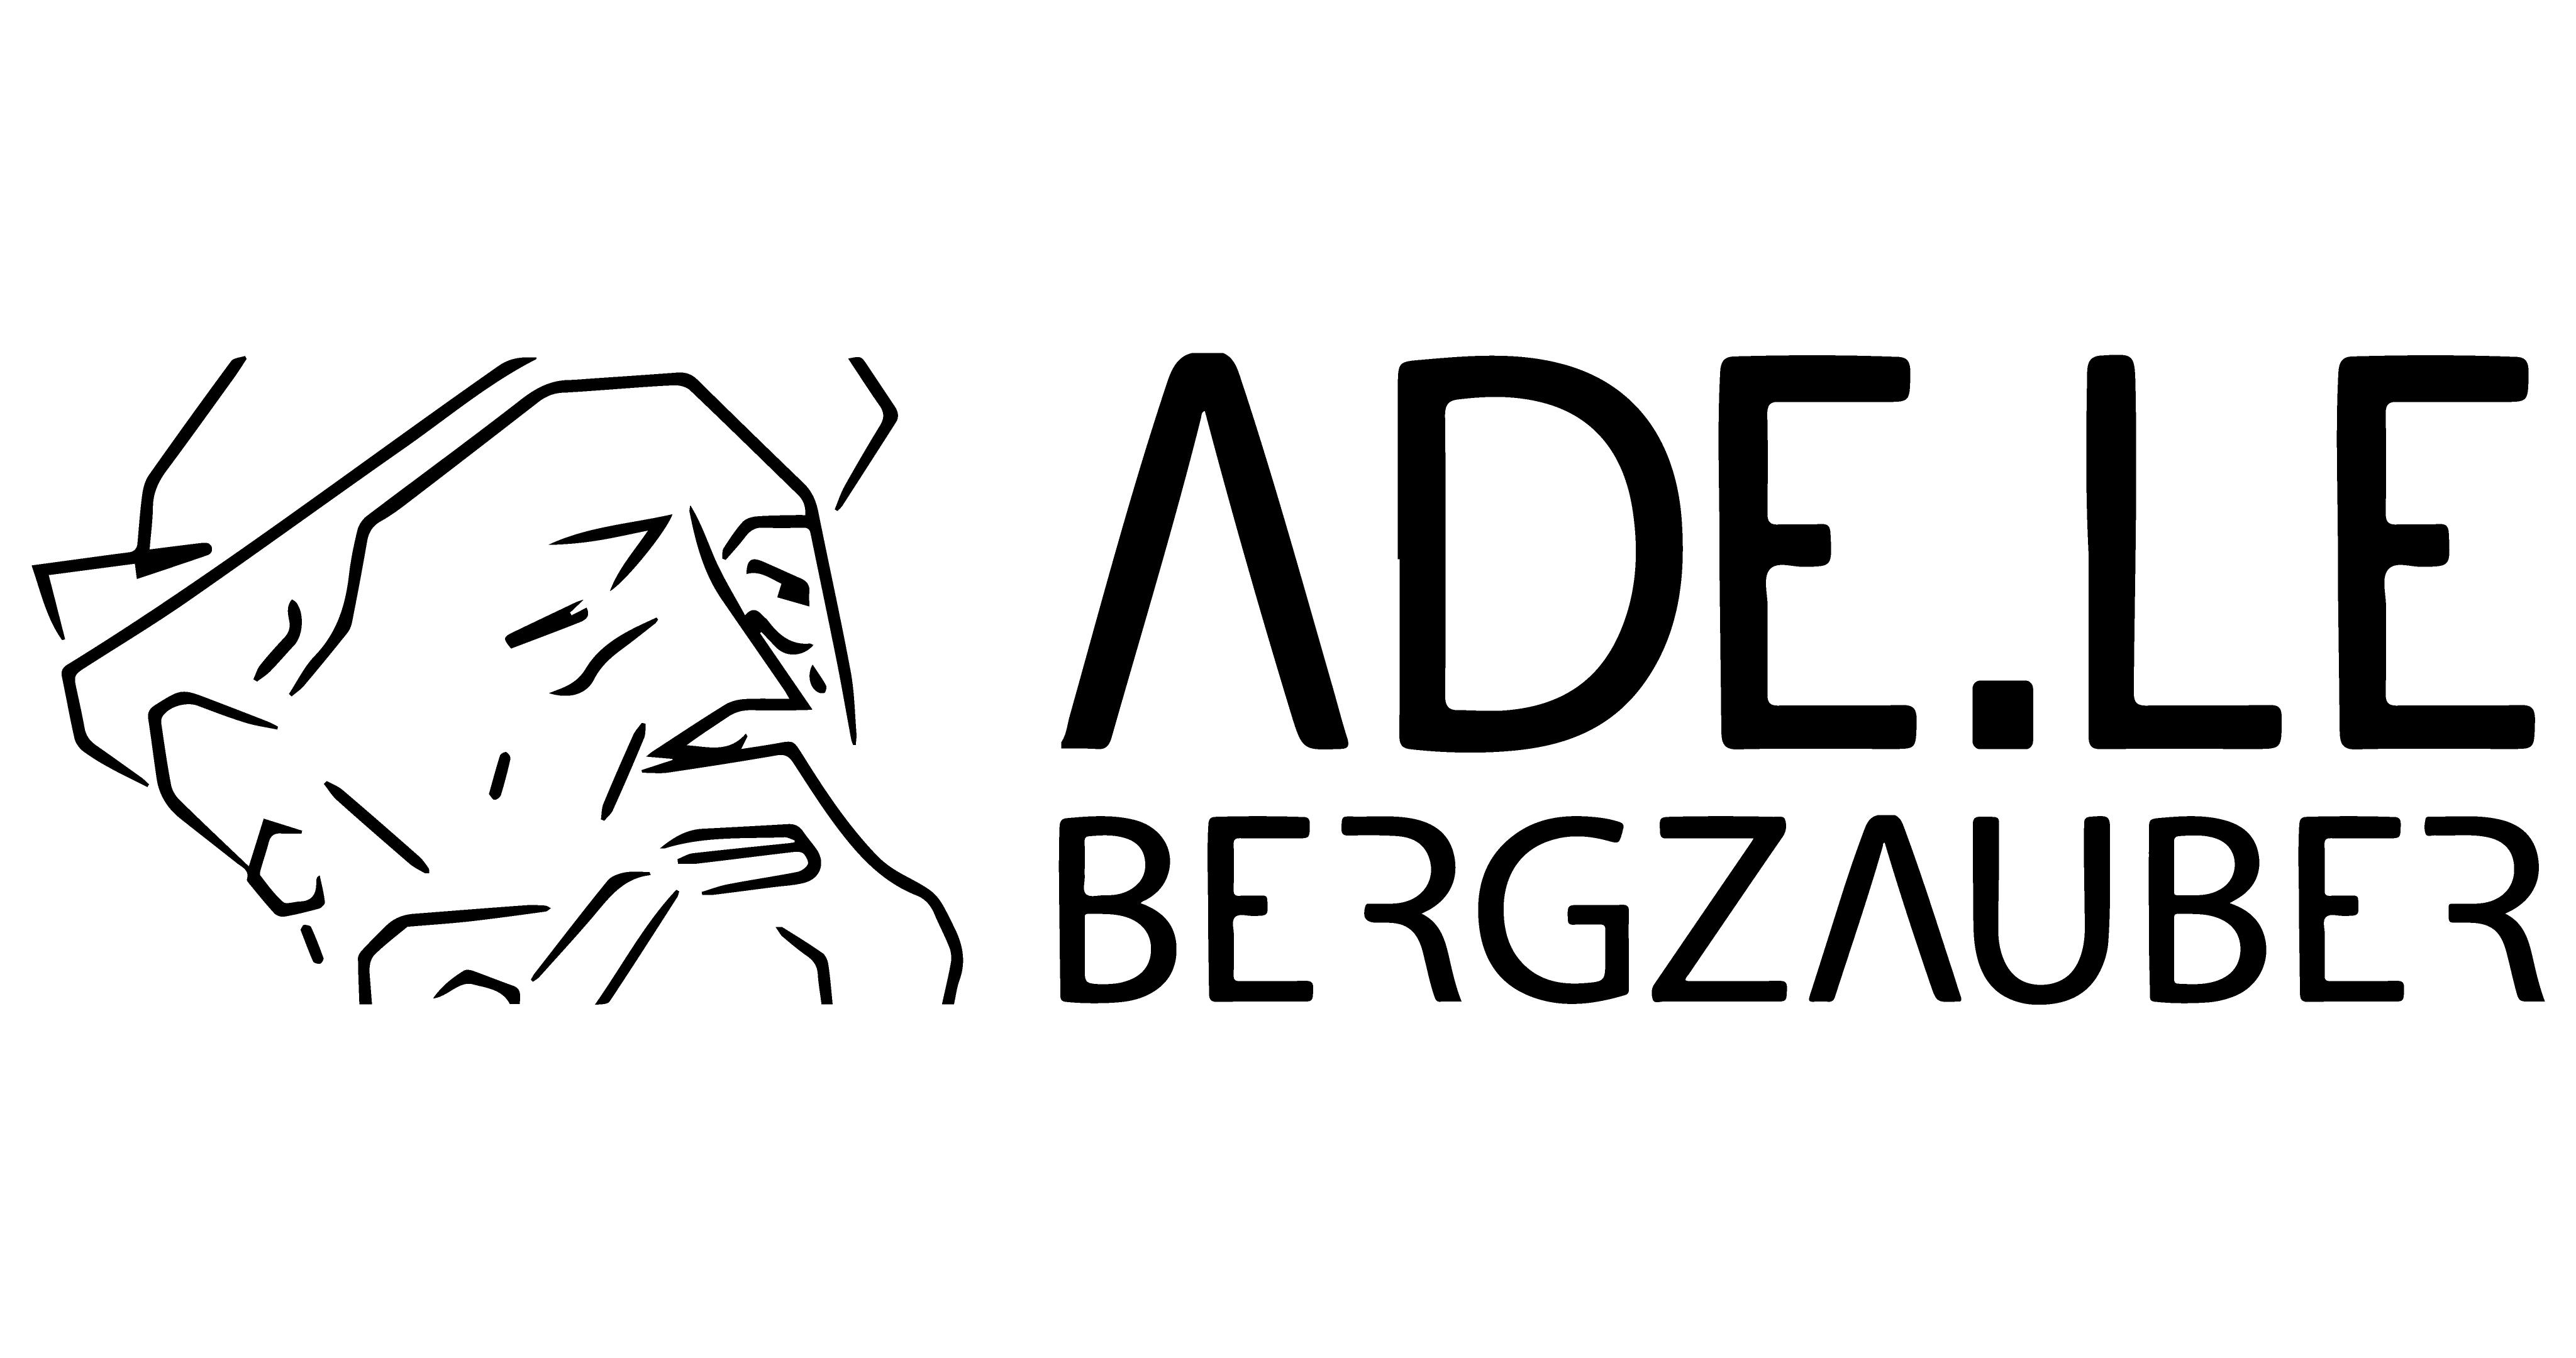 Adele Bergzauber